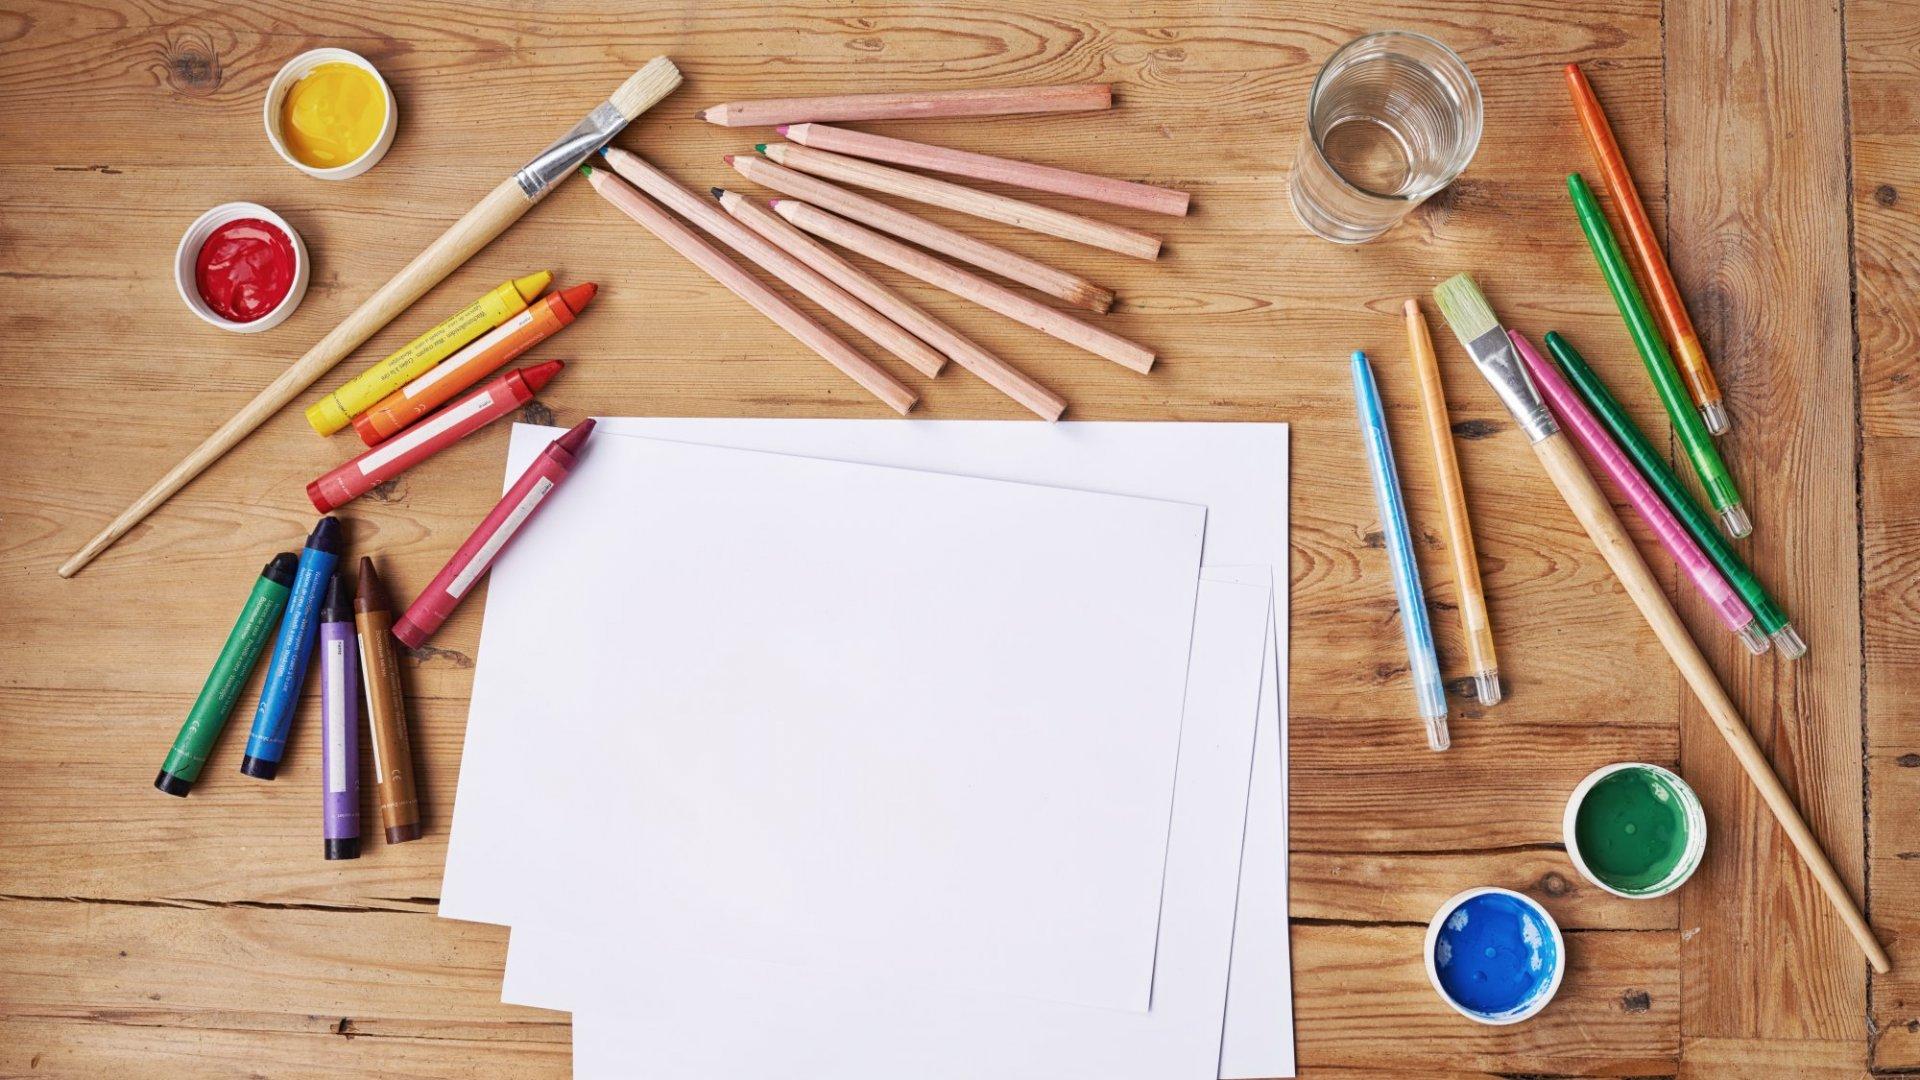 How Arts Education Can Develop Impactful Entrepreneurs